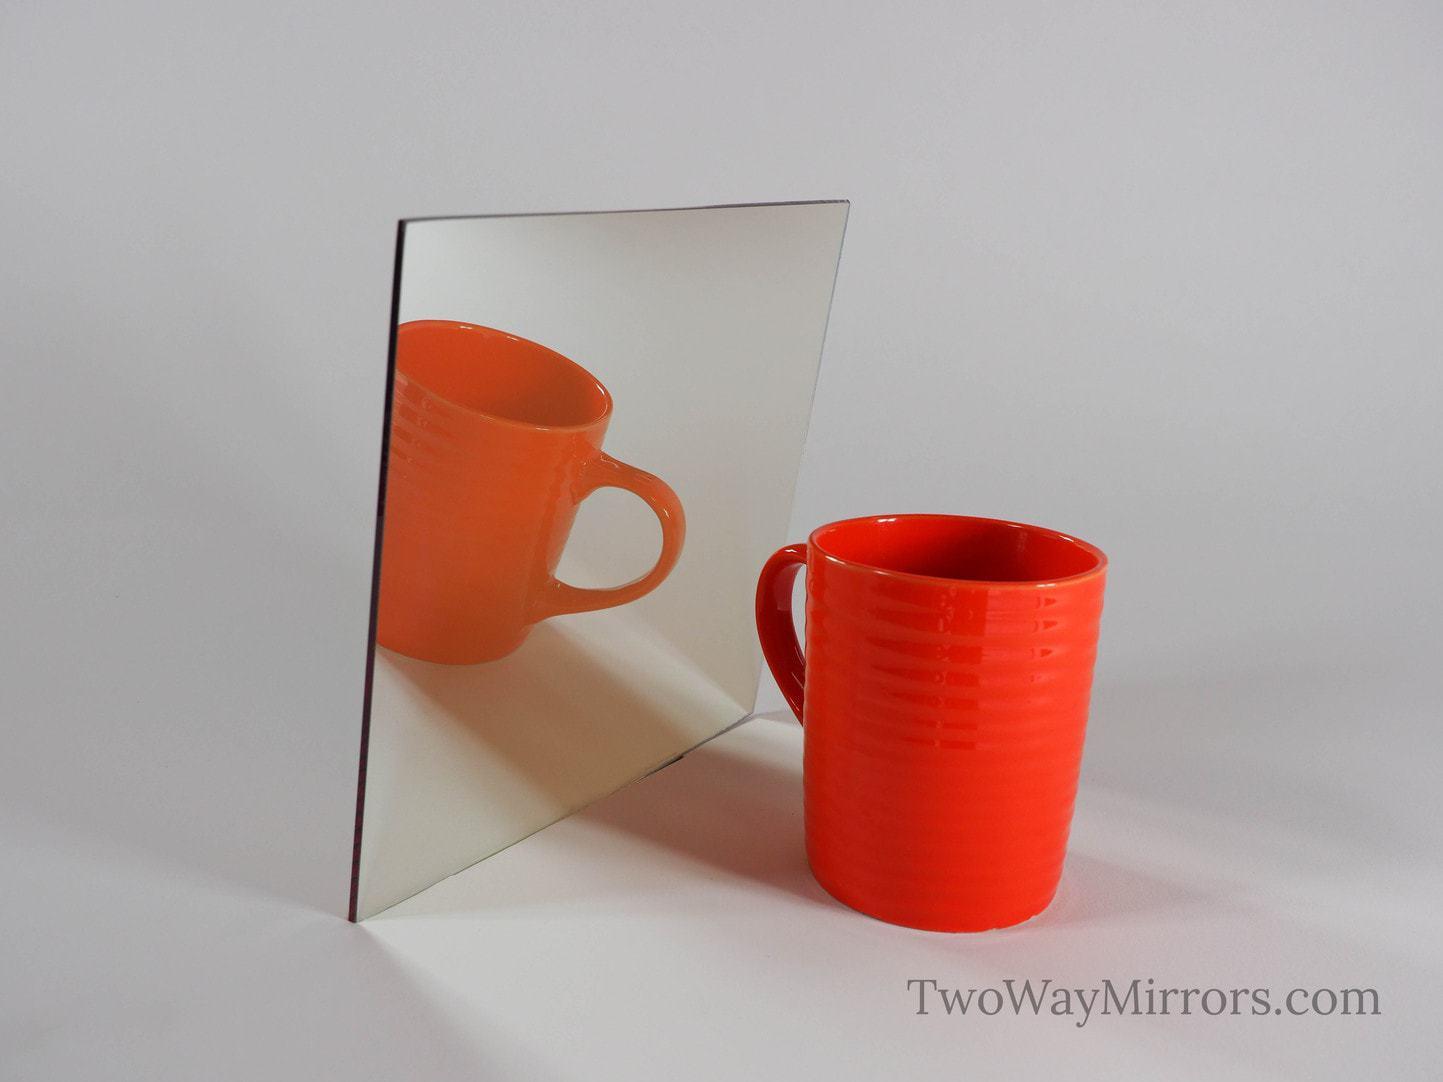 Vanity Vision Smart Mirror 8x8 3mm1